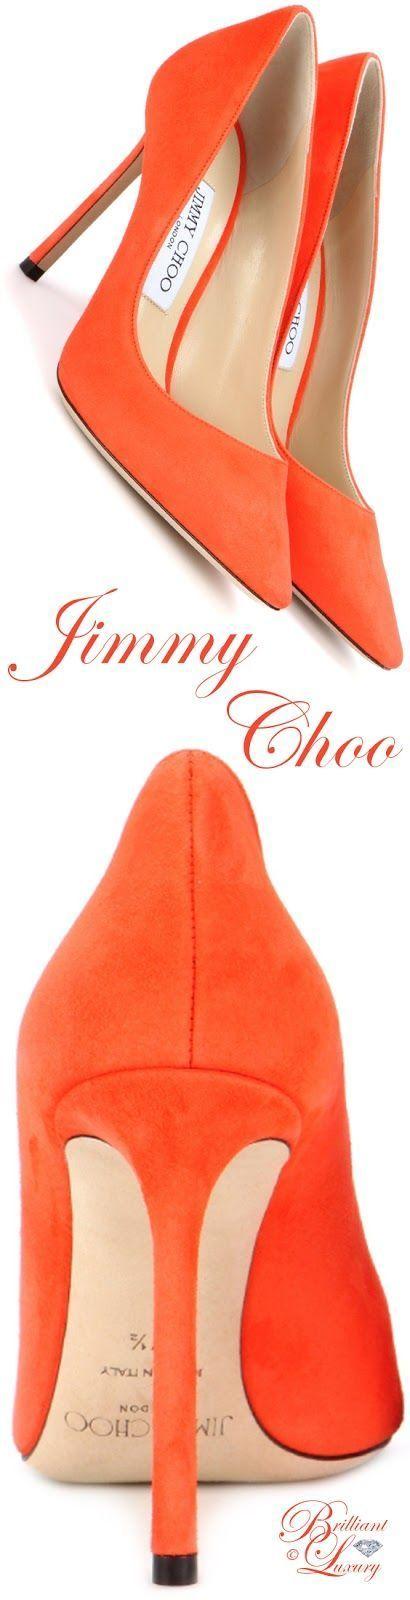 Brilliant Luxury by Emmy DE ♦ Jimmy Choo 'Romy' Suede Pumps #jimmychooheelssuede